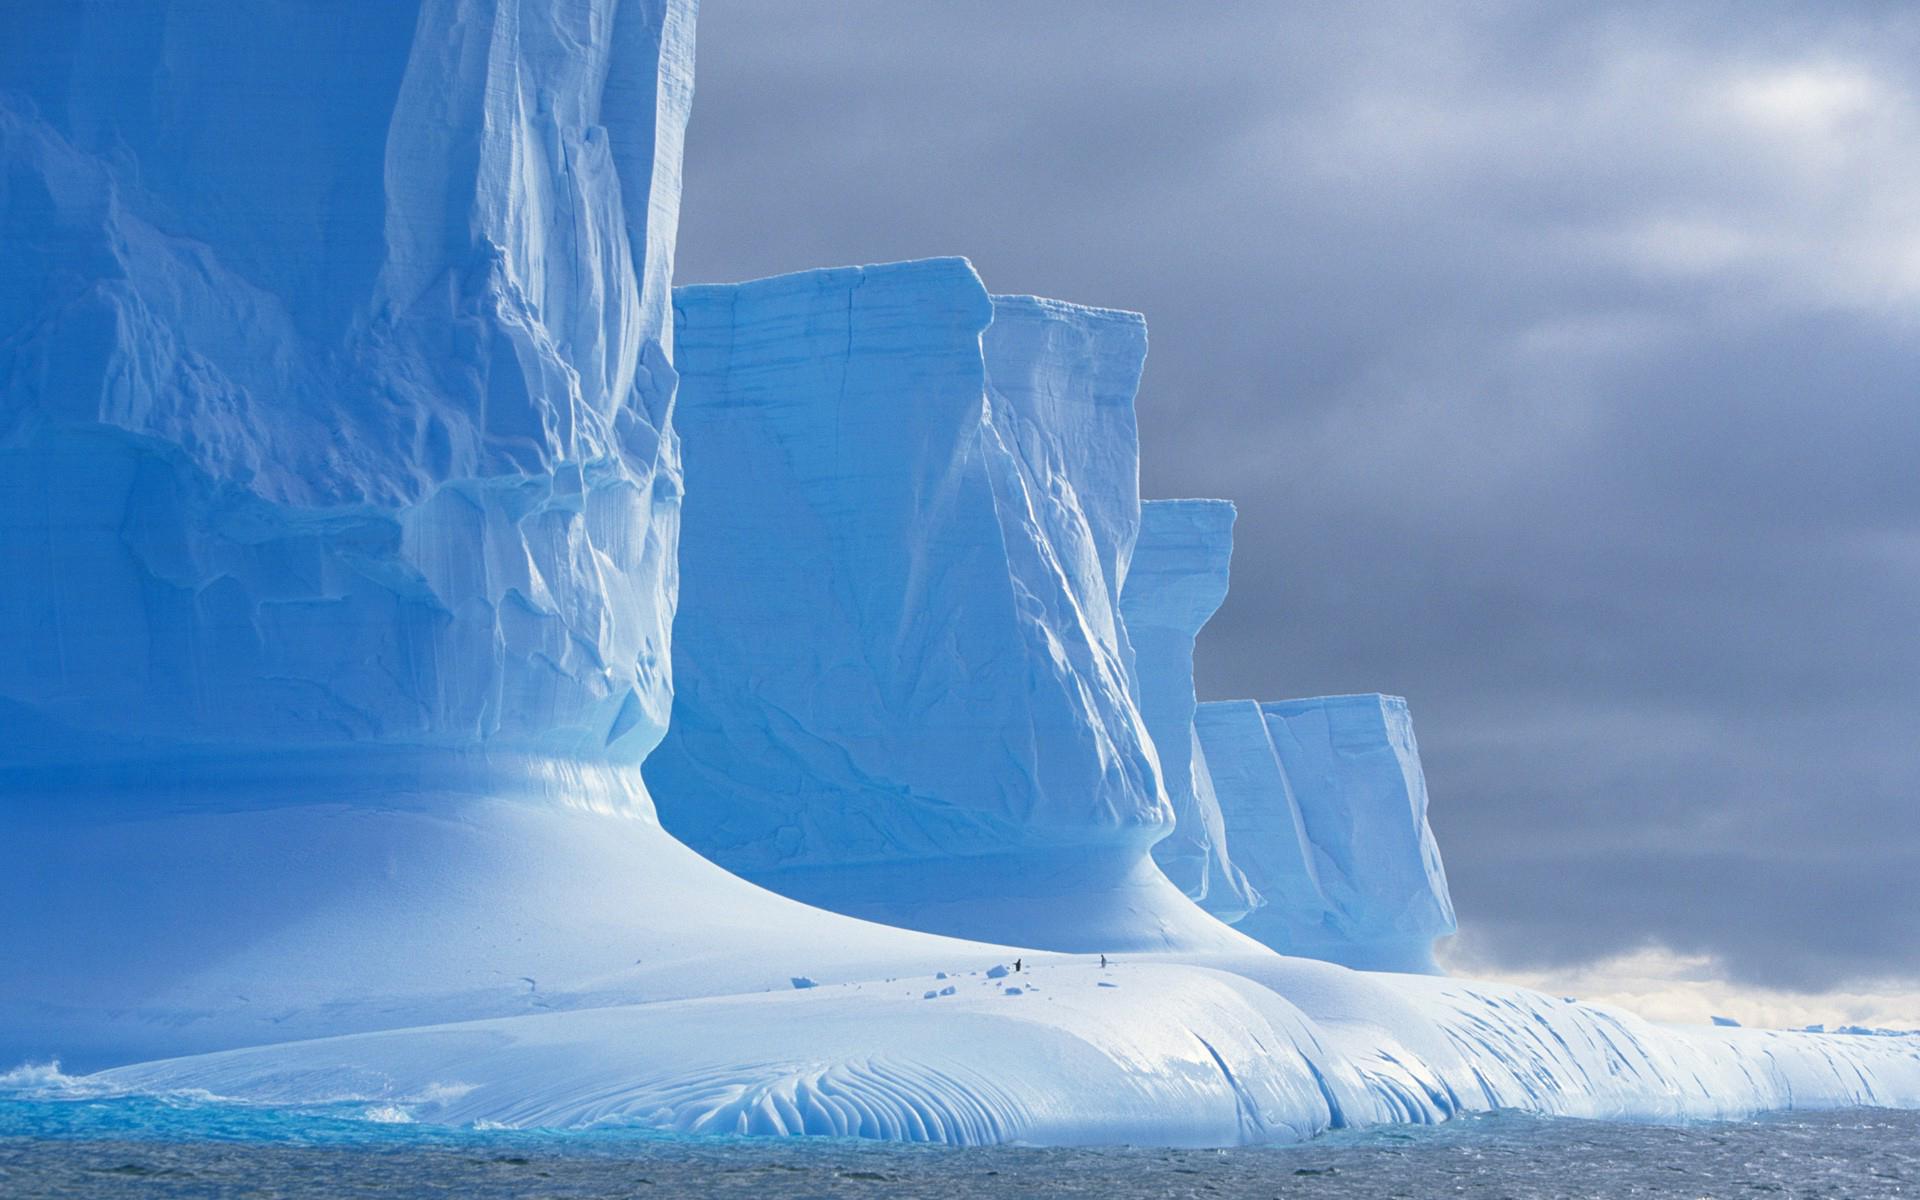 iceberg wallpaper arctic